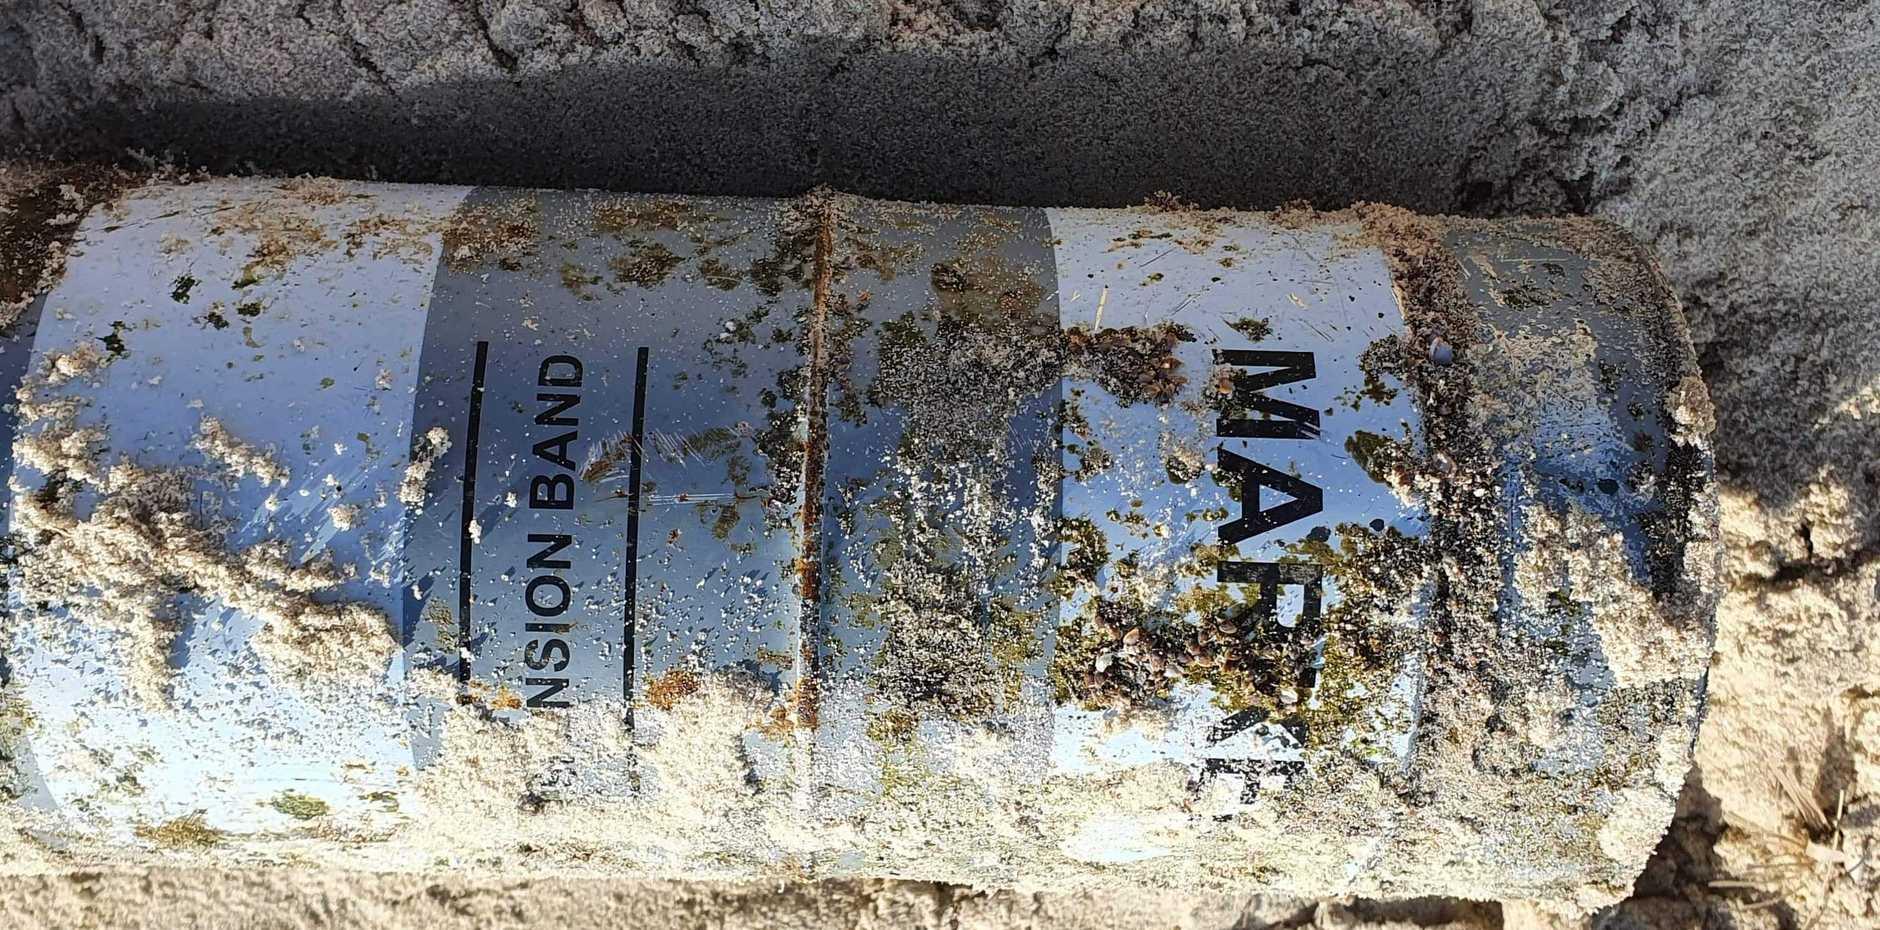 A military device washed up on Belongil Beach, Byron Bay.